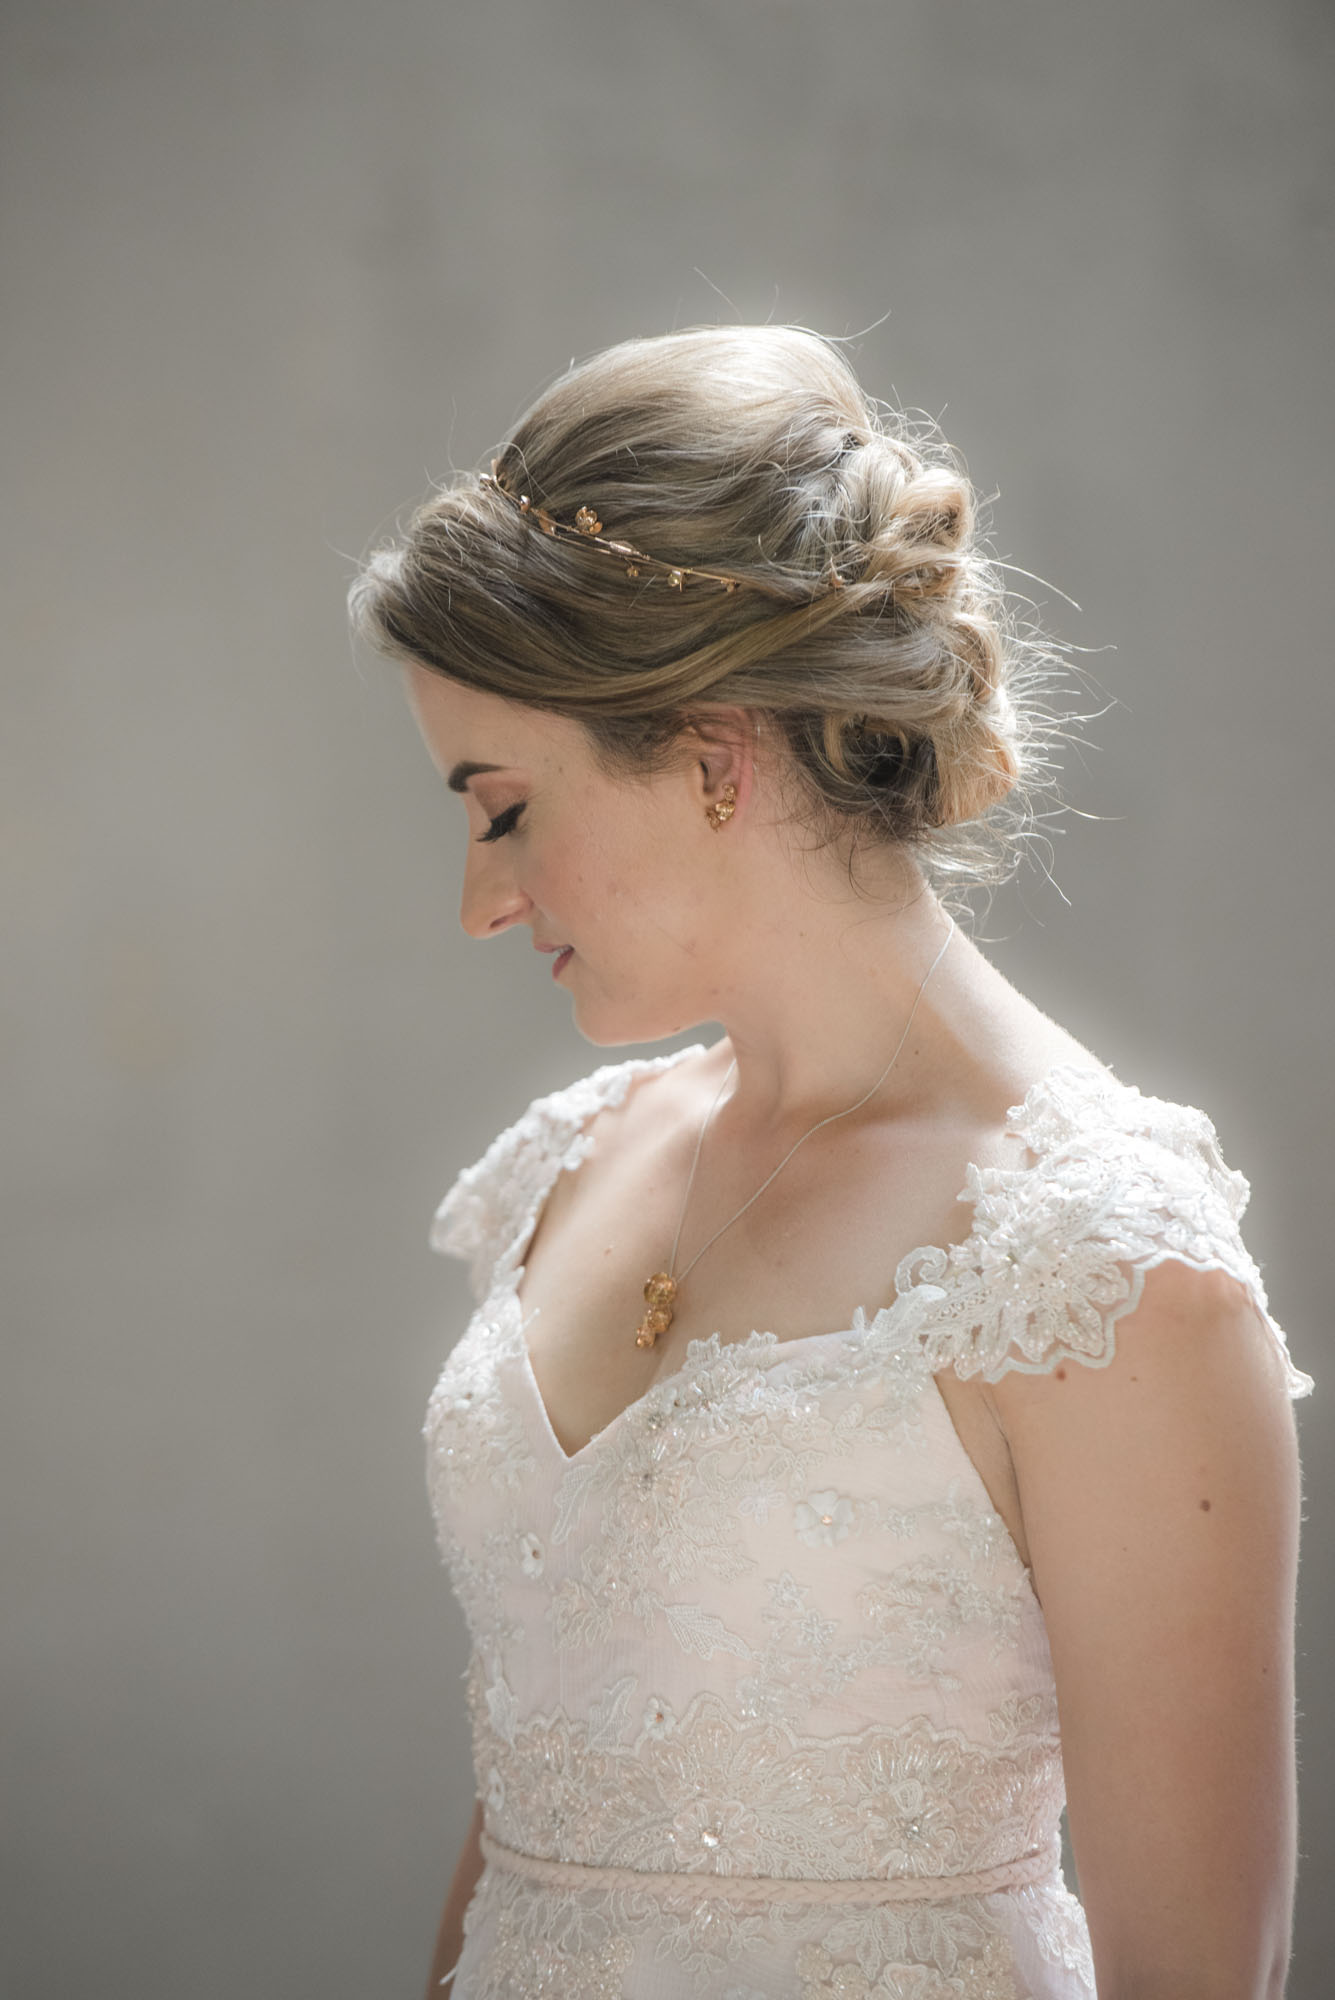 058aa-affordable-wedding-photographers-johannesburg058aa-affordable-wedding-photographers-johannesburg_a.jpg